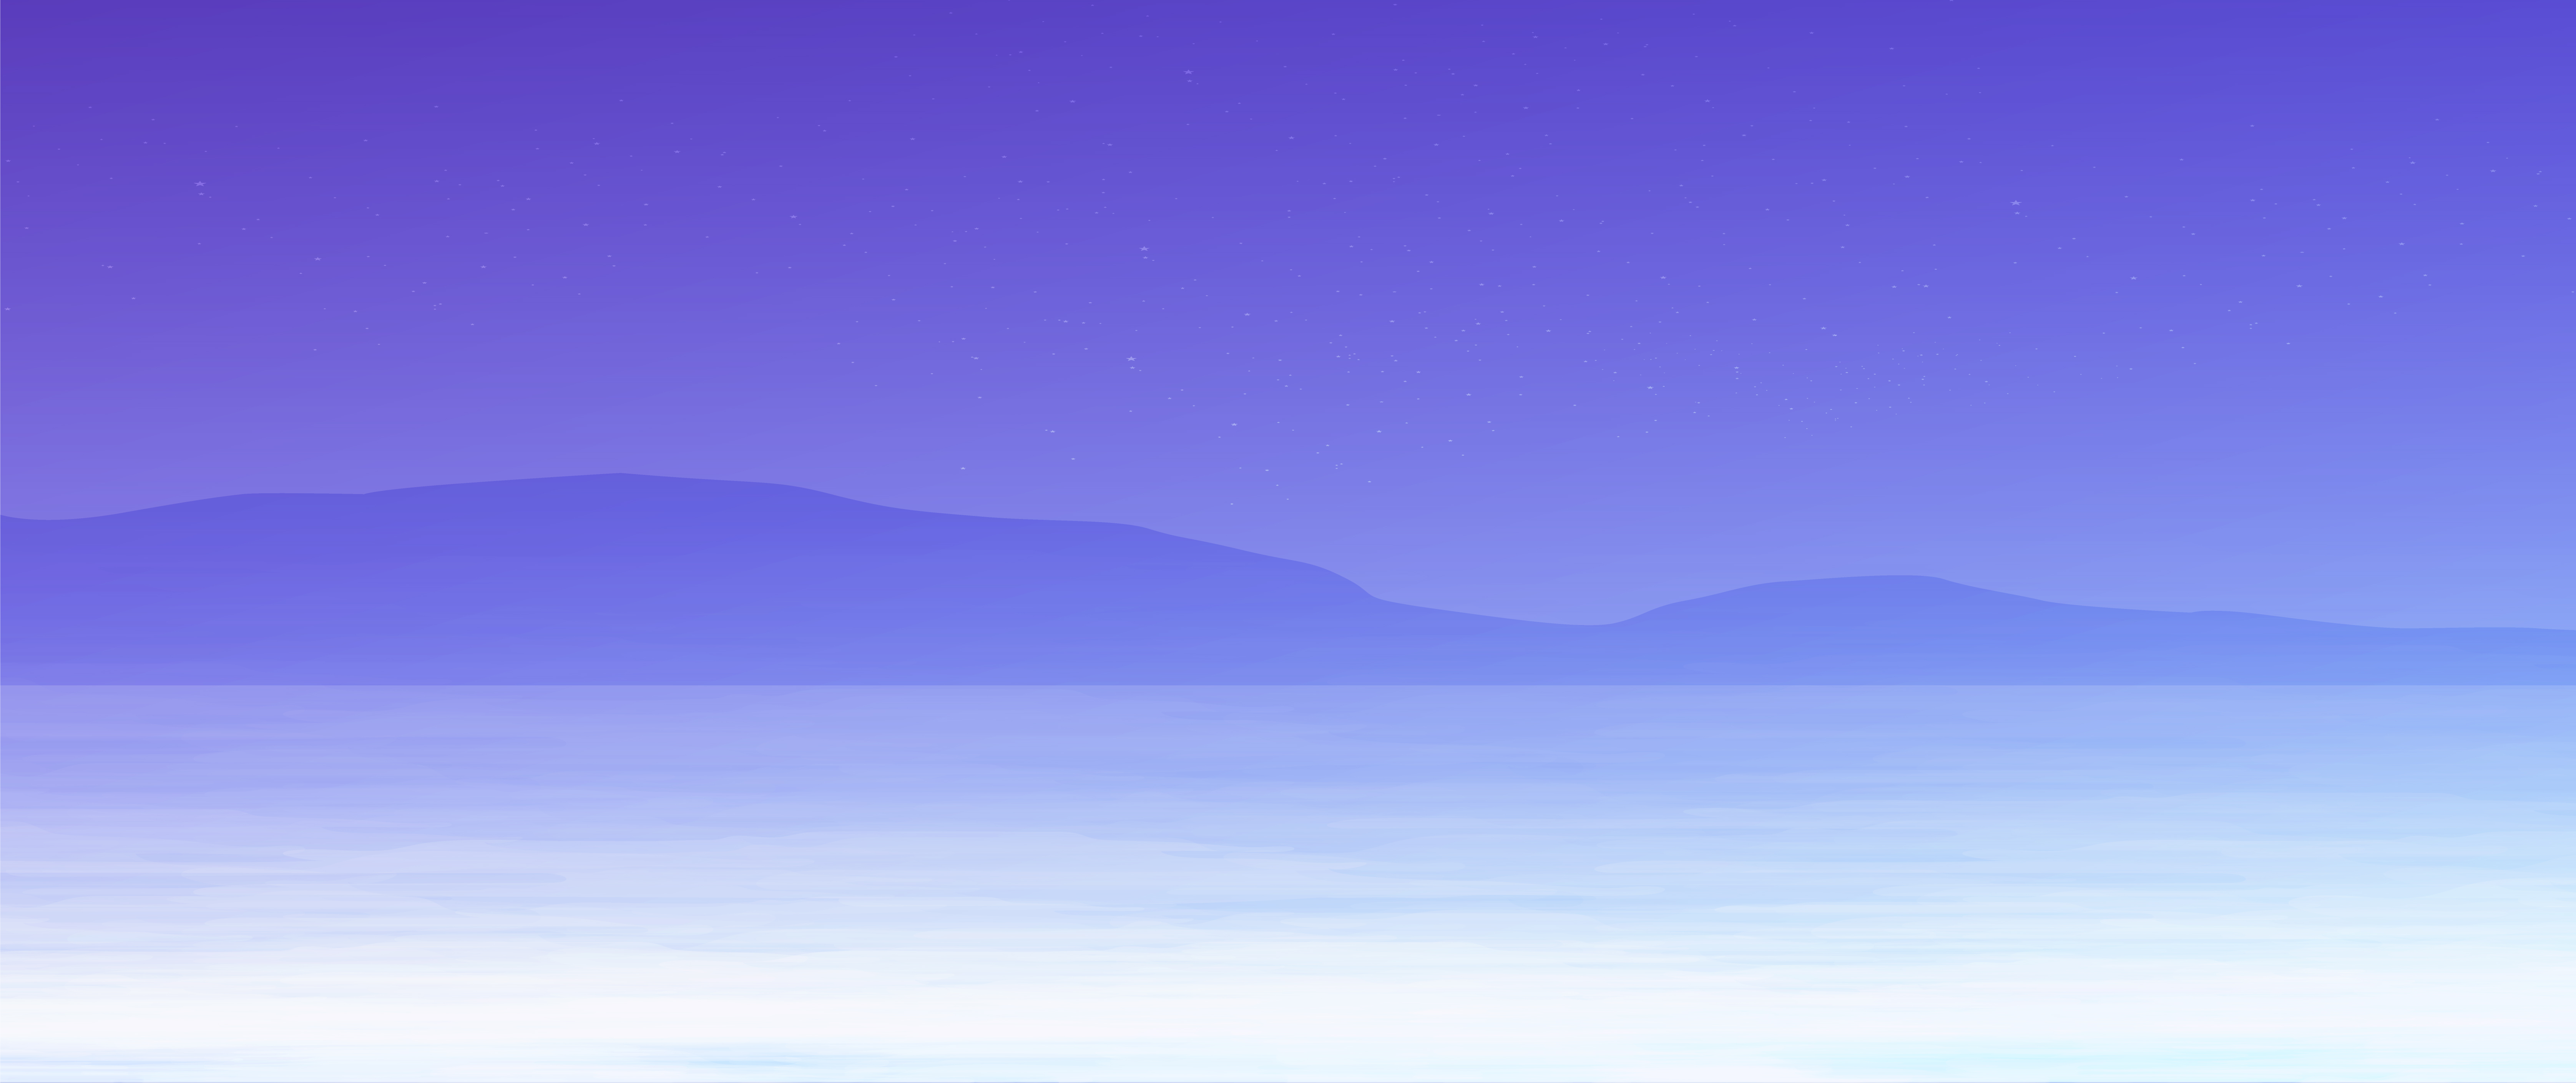 Beautiful Sea Of Frog Background,landscape,Comic Cartoon Concept  Design,vector Illustration 2254950 Vector Art At Vecteezy